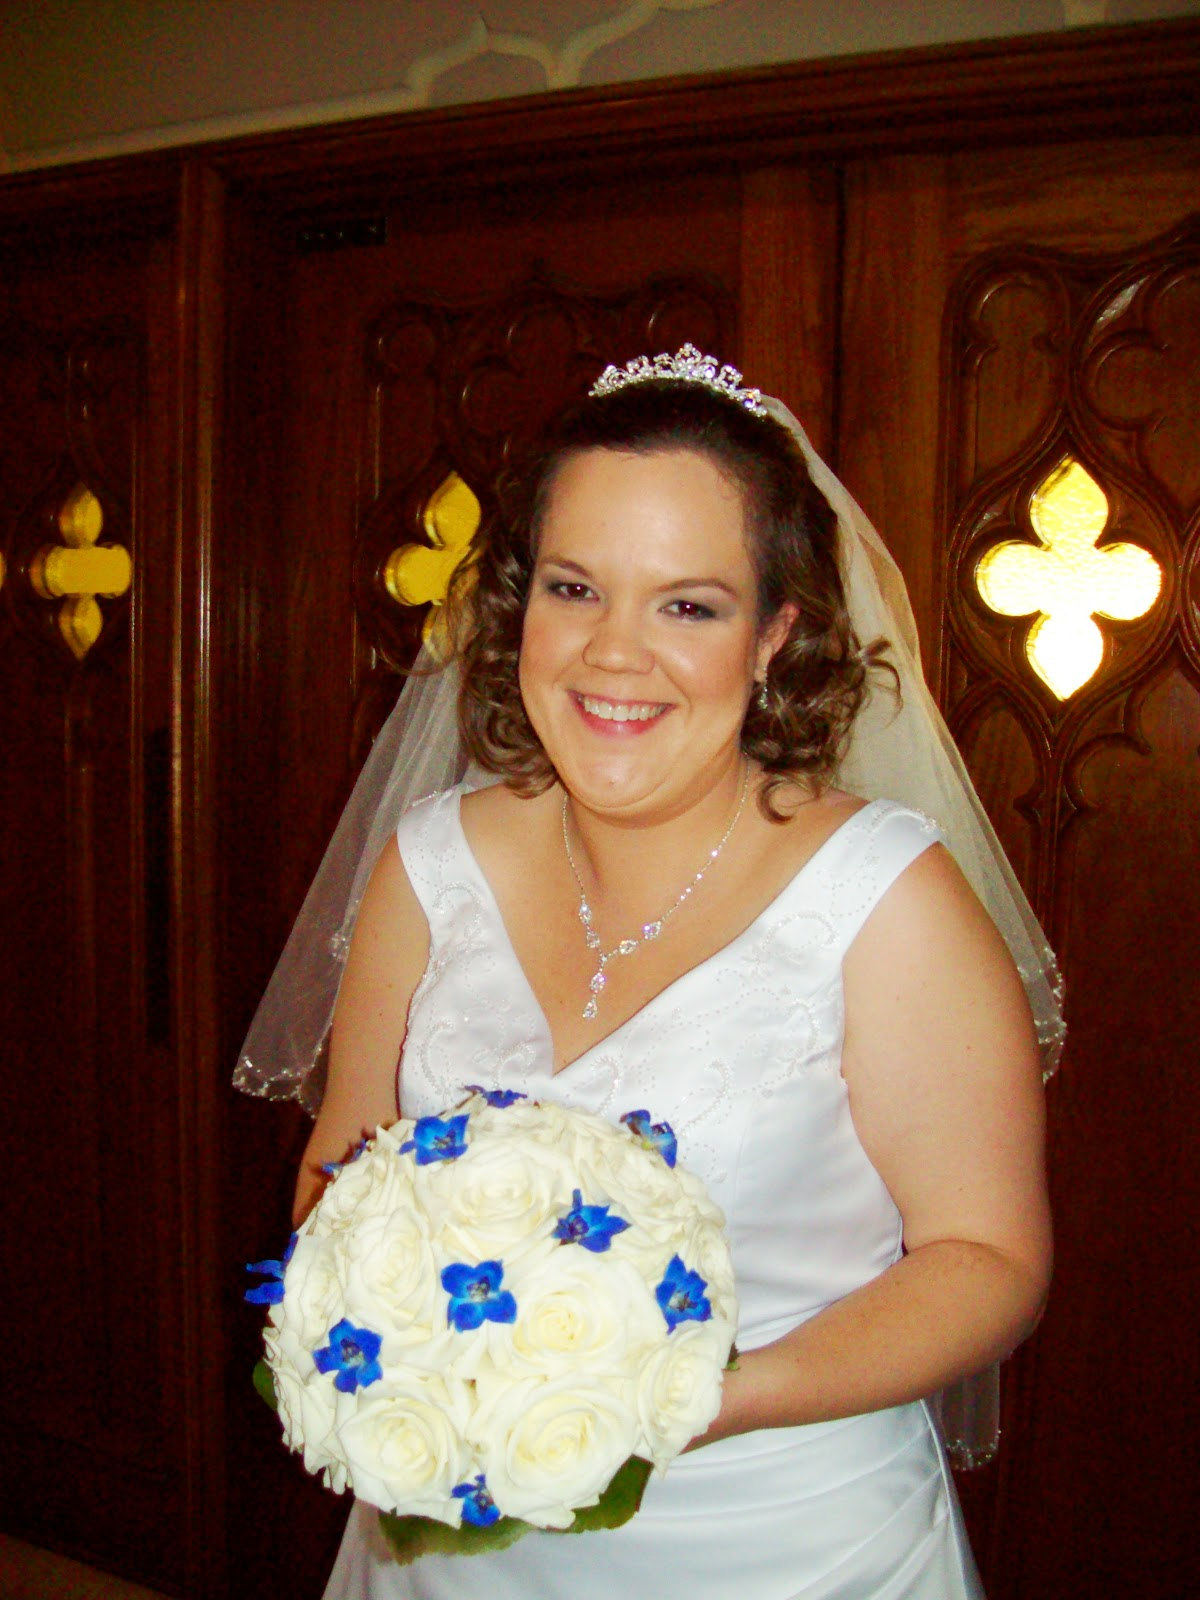 Our Wedding, photos by Brandon Moeller - 100_6367adjust_web.jpg